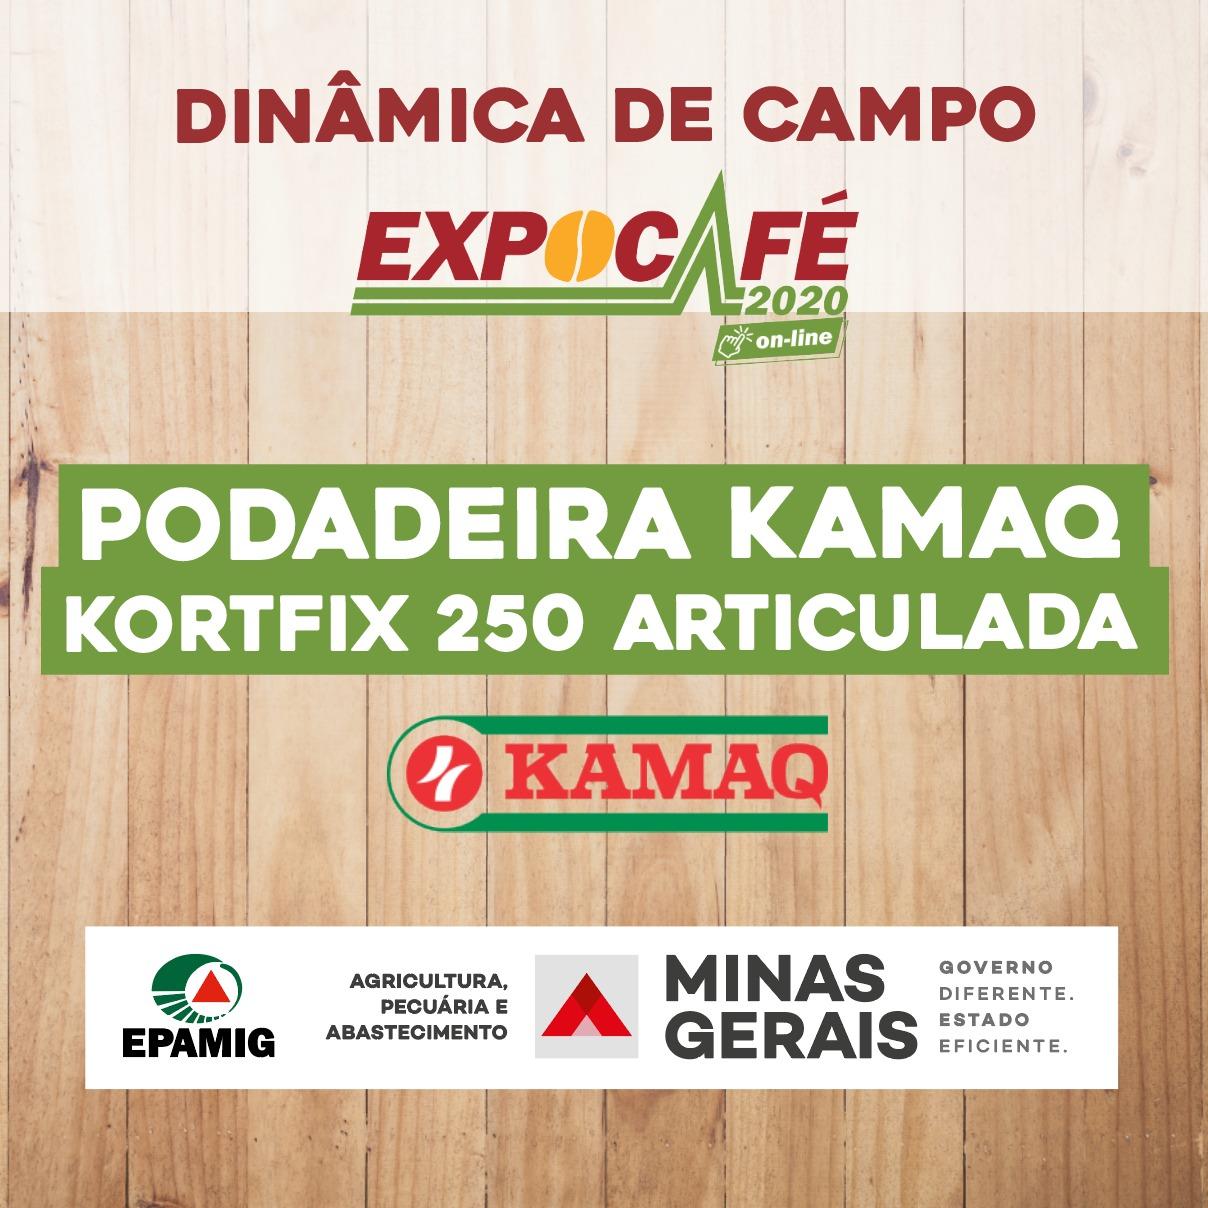 Podadeira Kamaq KORTFIX 250 articulada